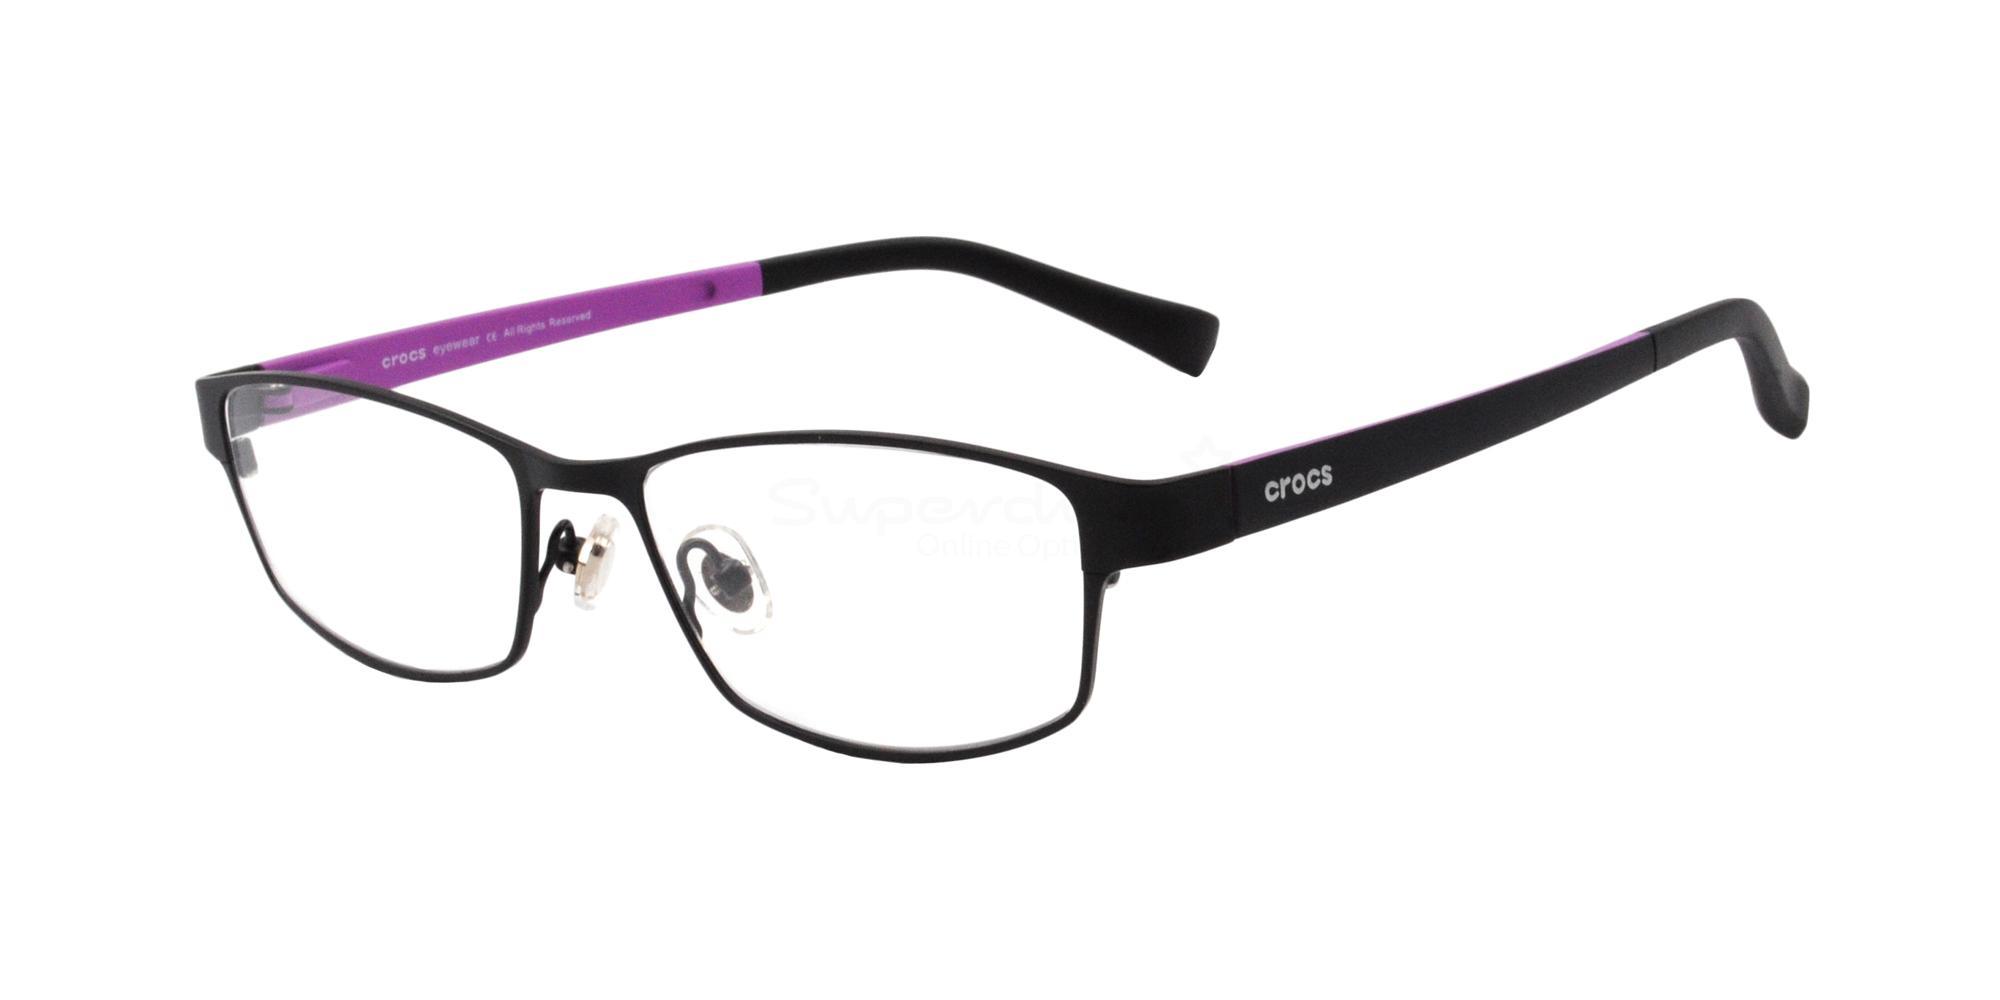 20PE CF4004 Glasses, Crocs Eyewear